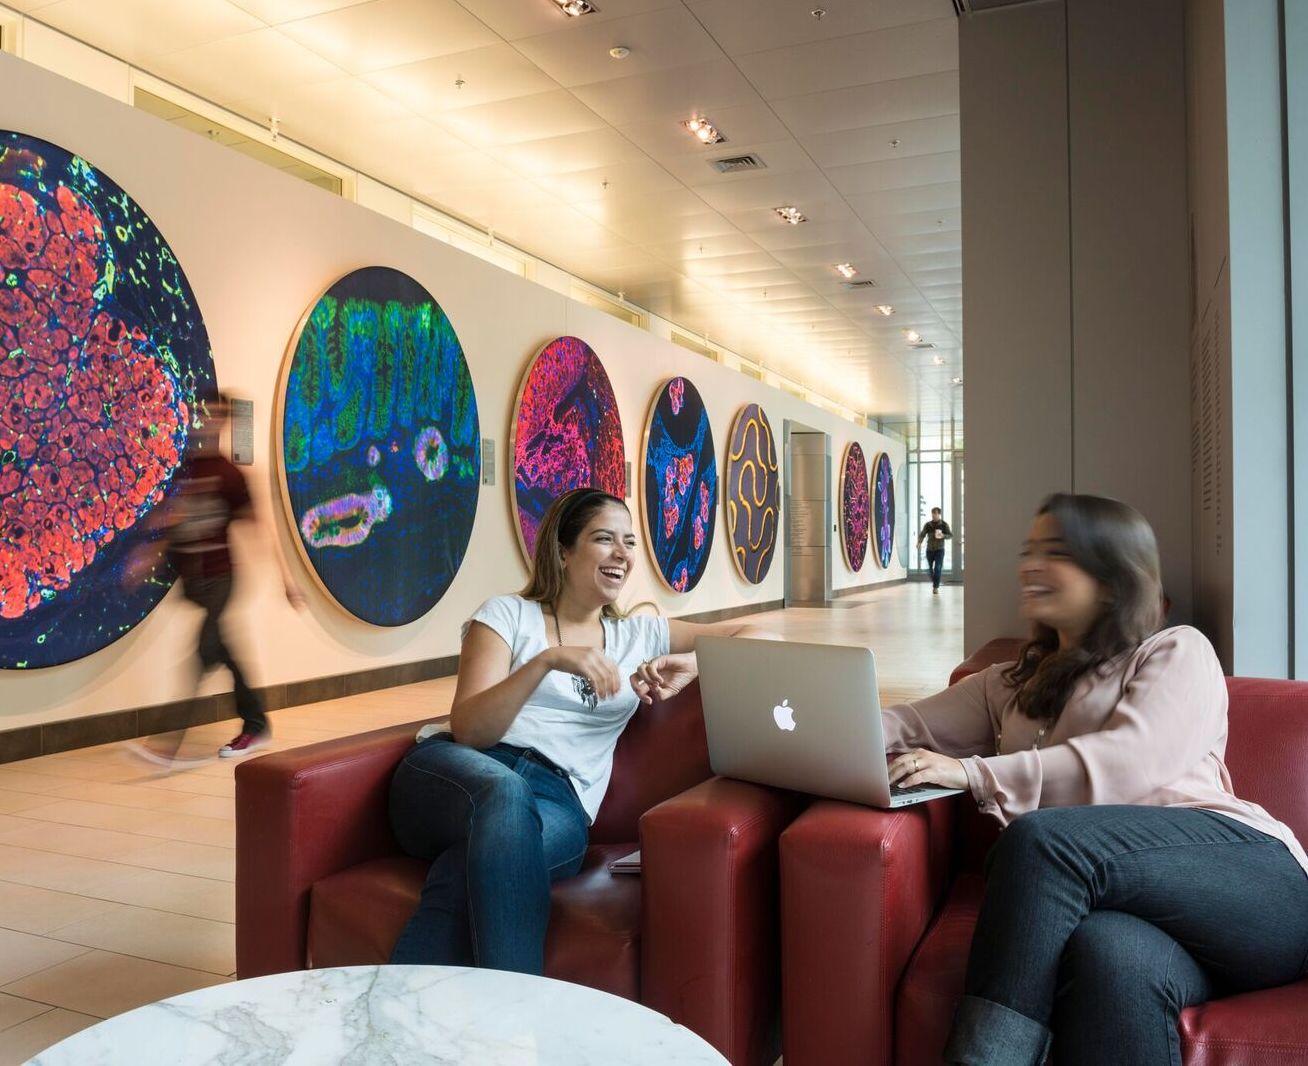 About MIT | MIT - Massachusetts Institute of Technology